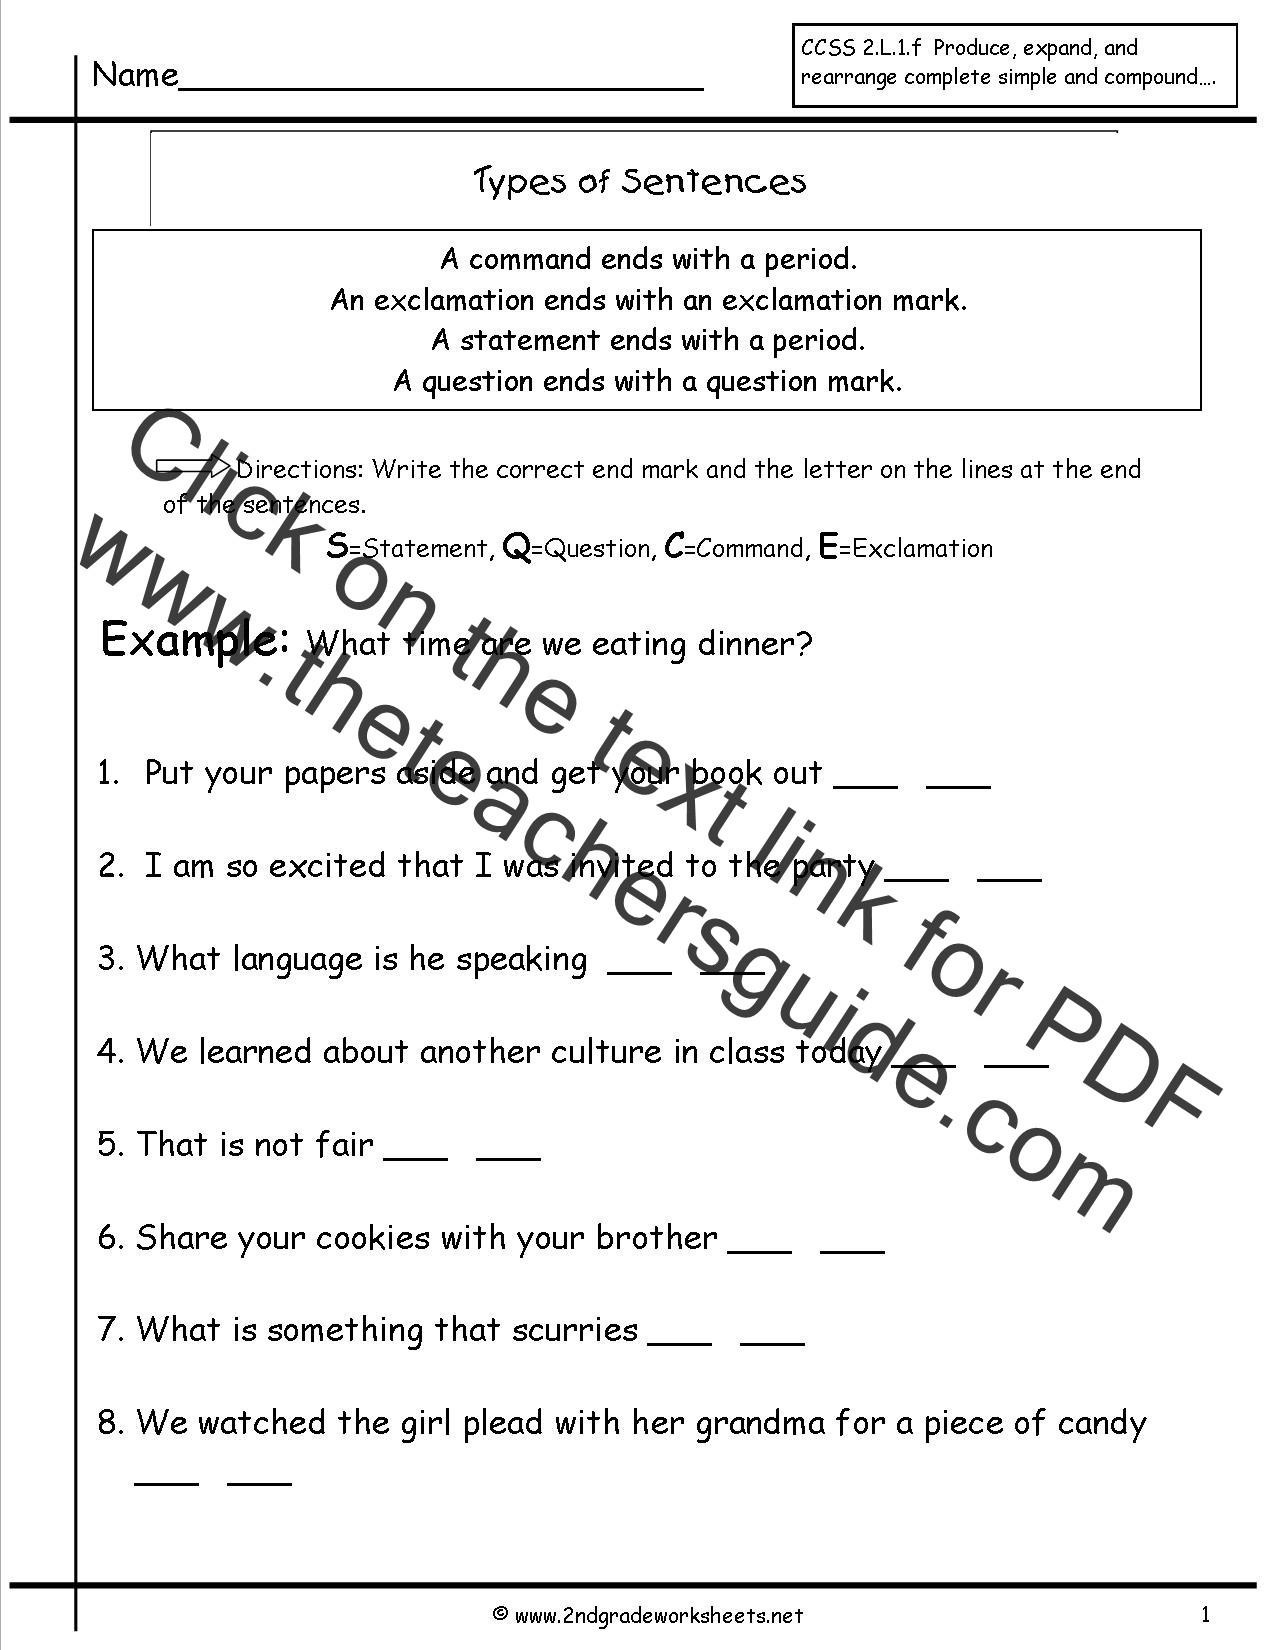 Compound Sentences Worksheet Pdf Second Grade Sentences Worksheets Ccss 2 L 1 F Worksheets